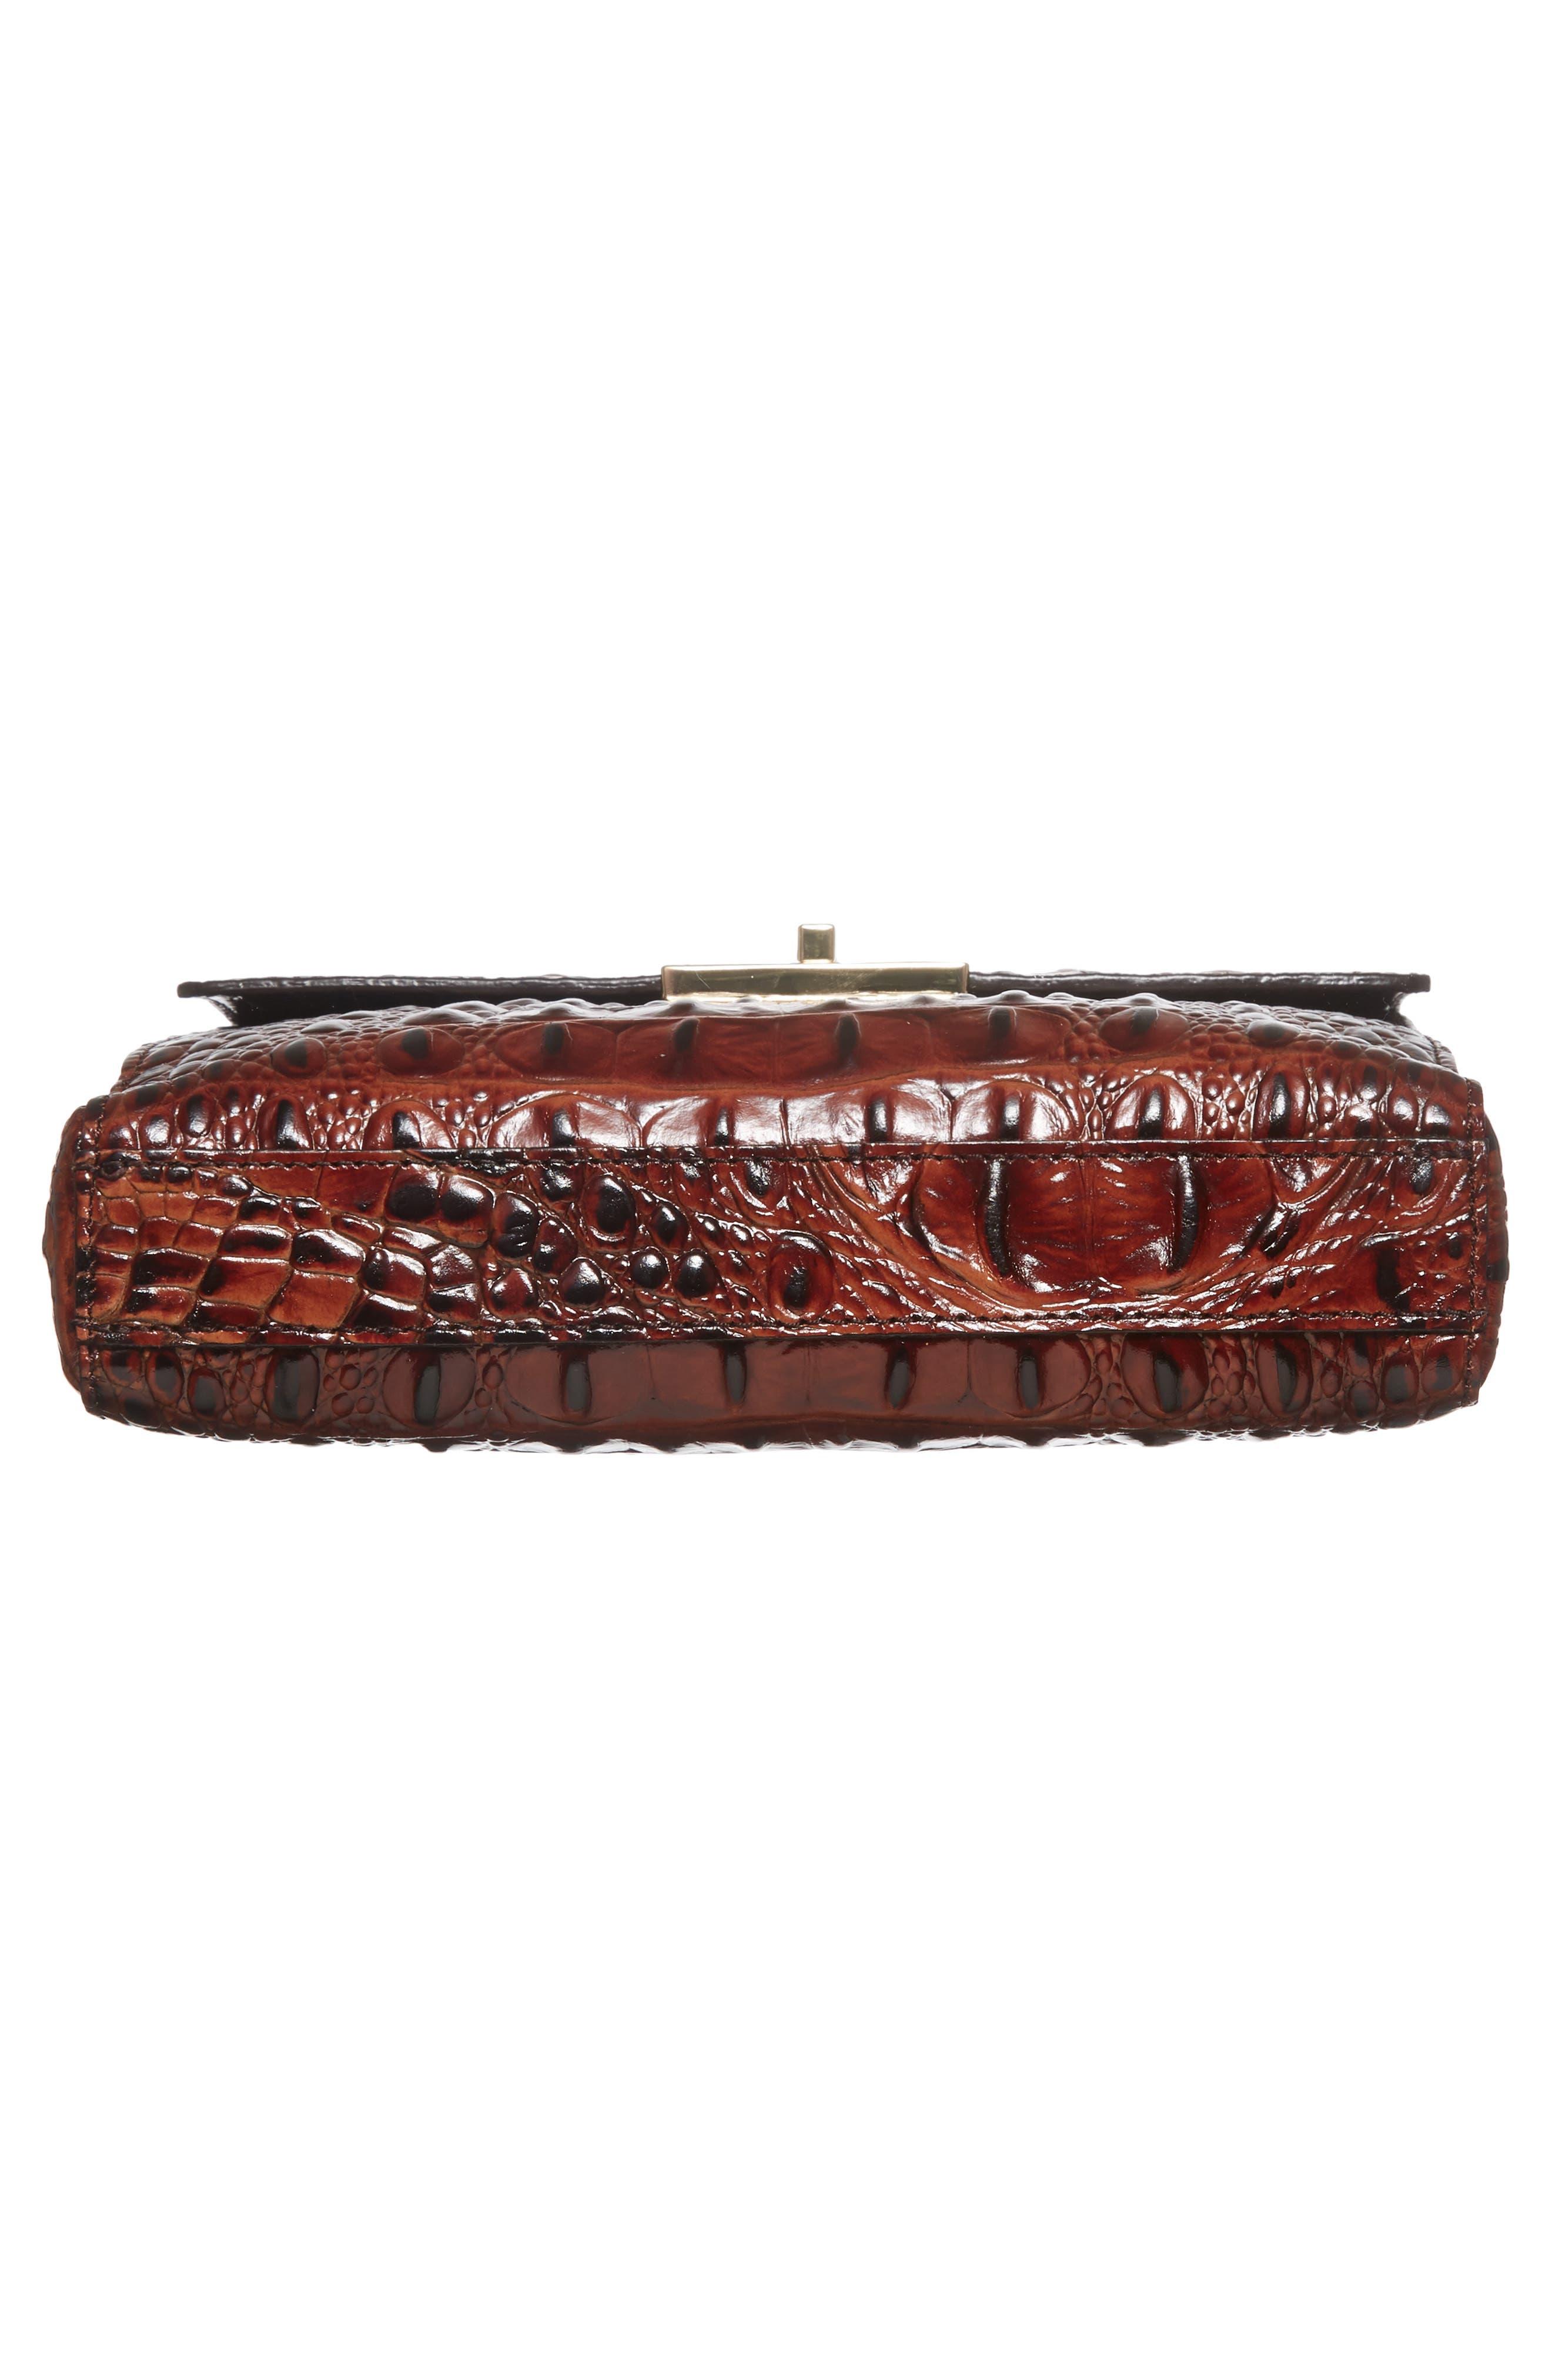 Melbourne Manhattan Croc Embossed Leather Crossbody Bag,                             Alternate thumbnail 6, color,                             PECAN